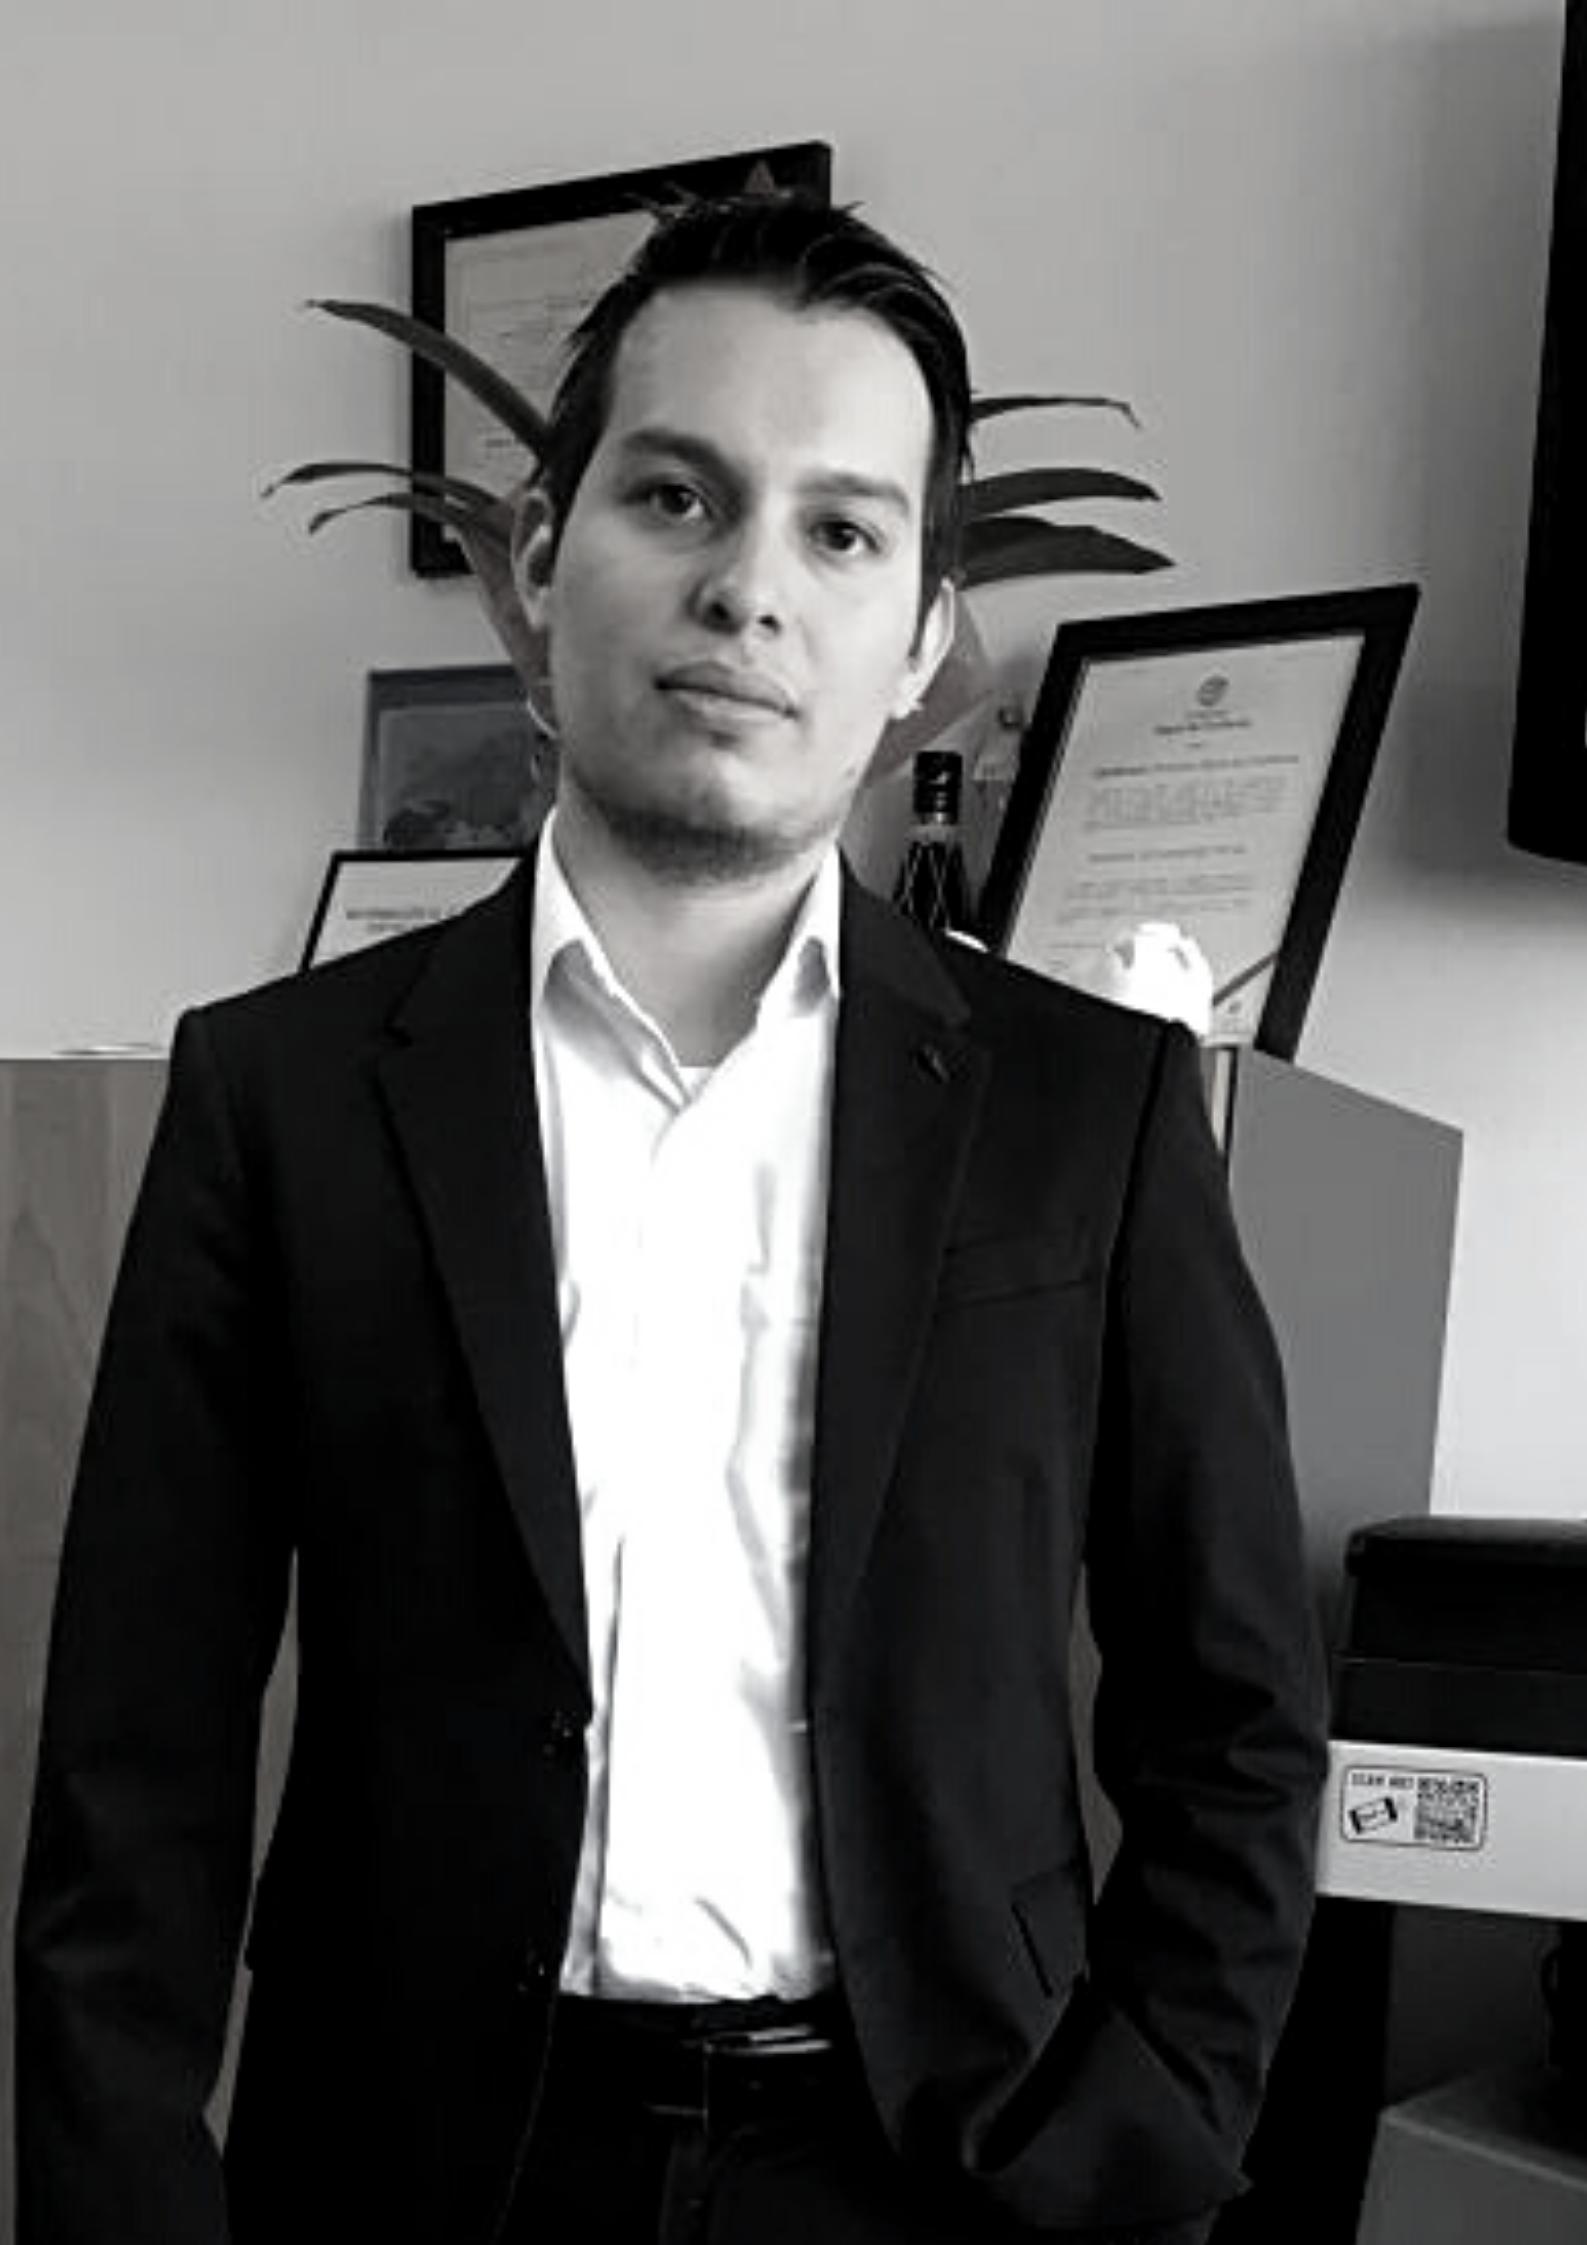 Jonathan-web-development